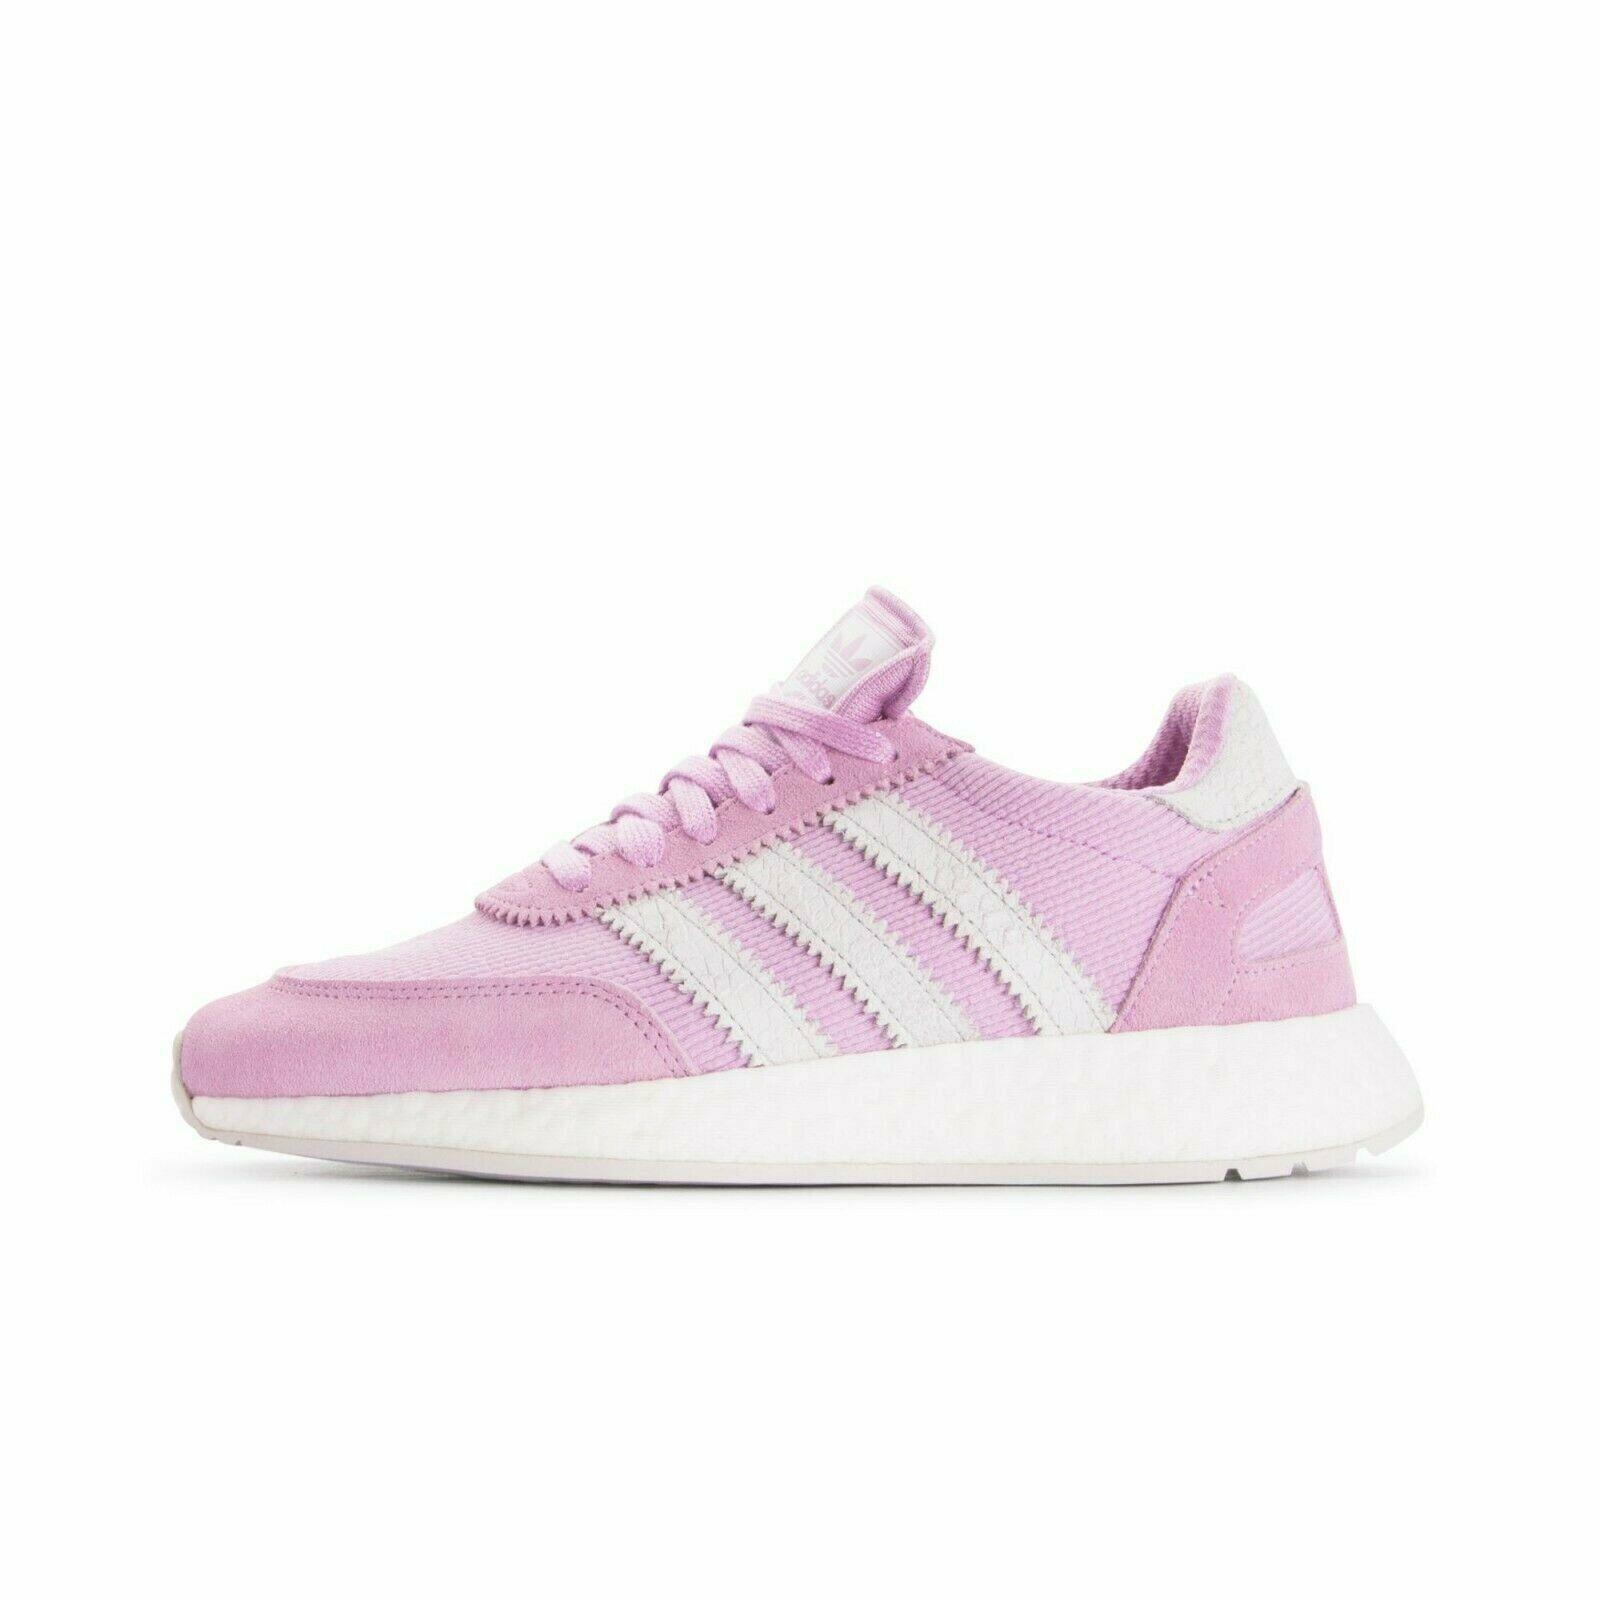 Women adidas I-5923 Clear purplec Crystal White D96619